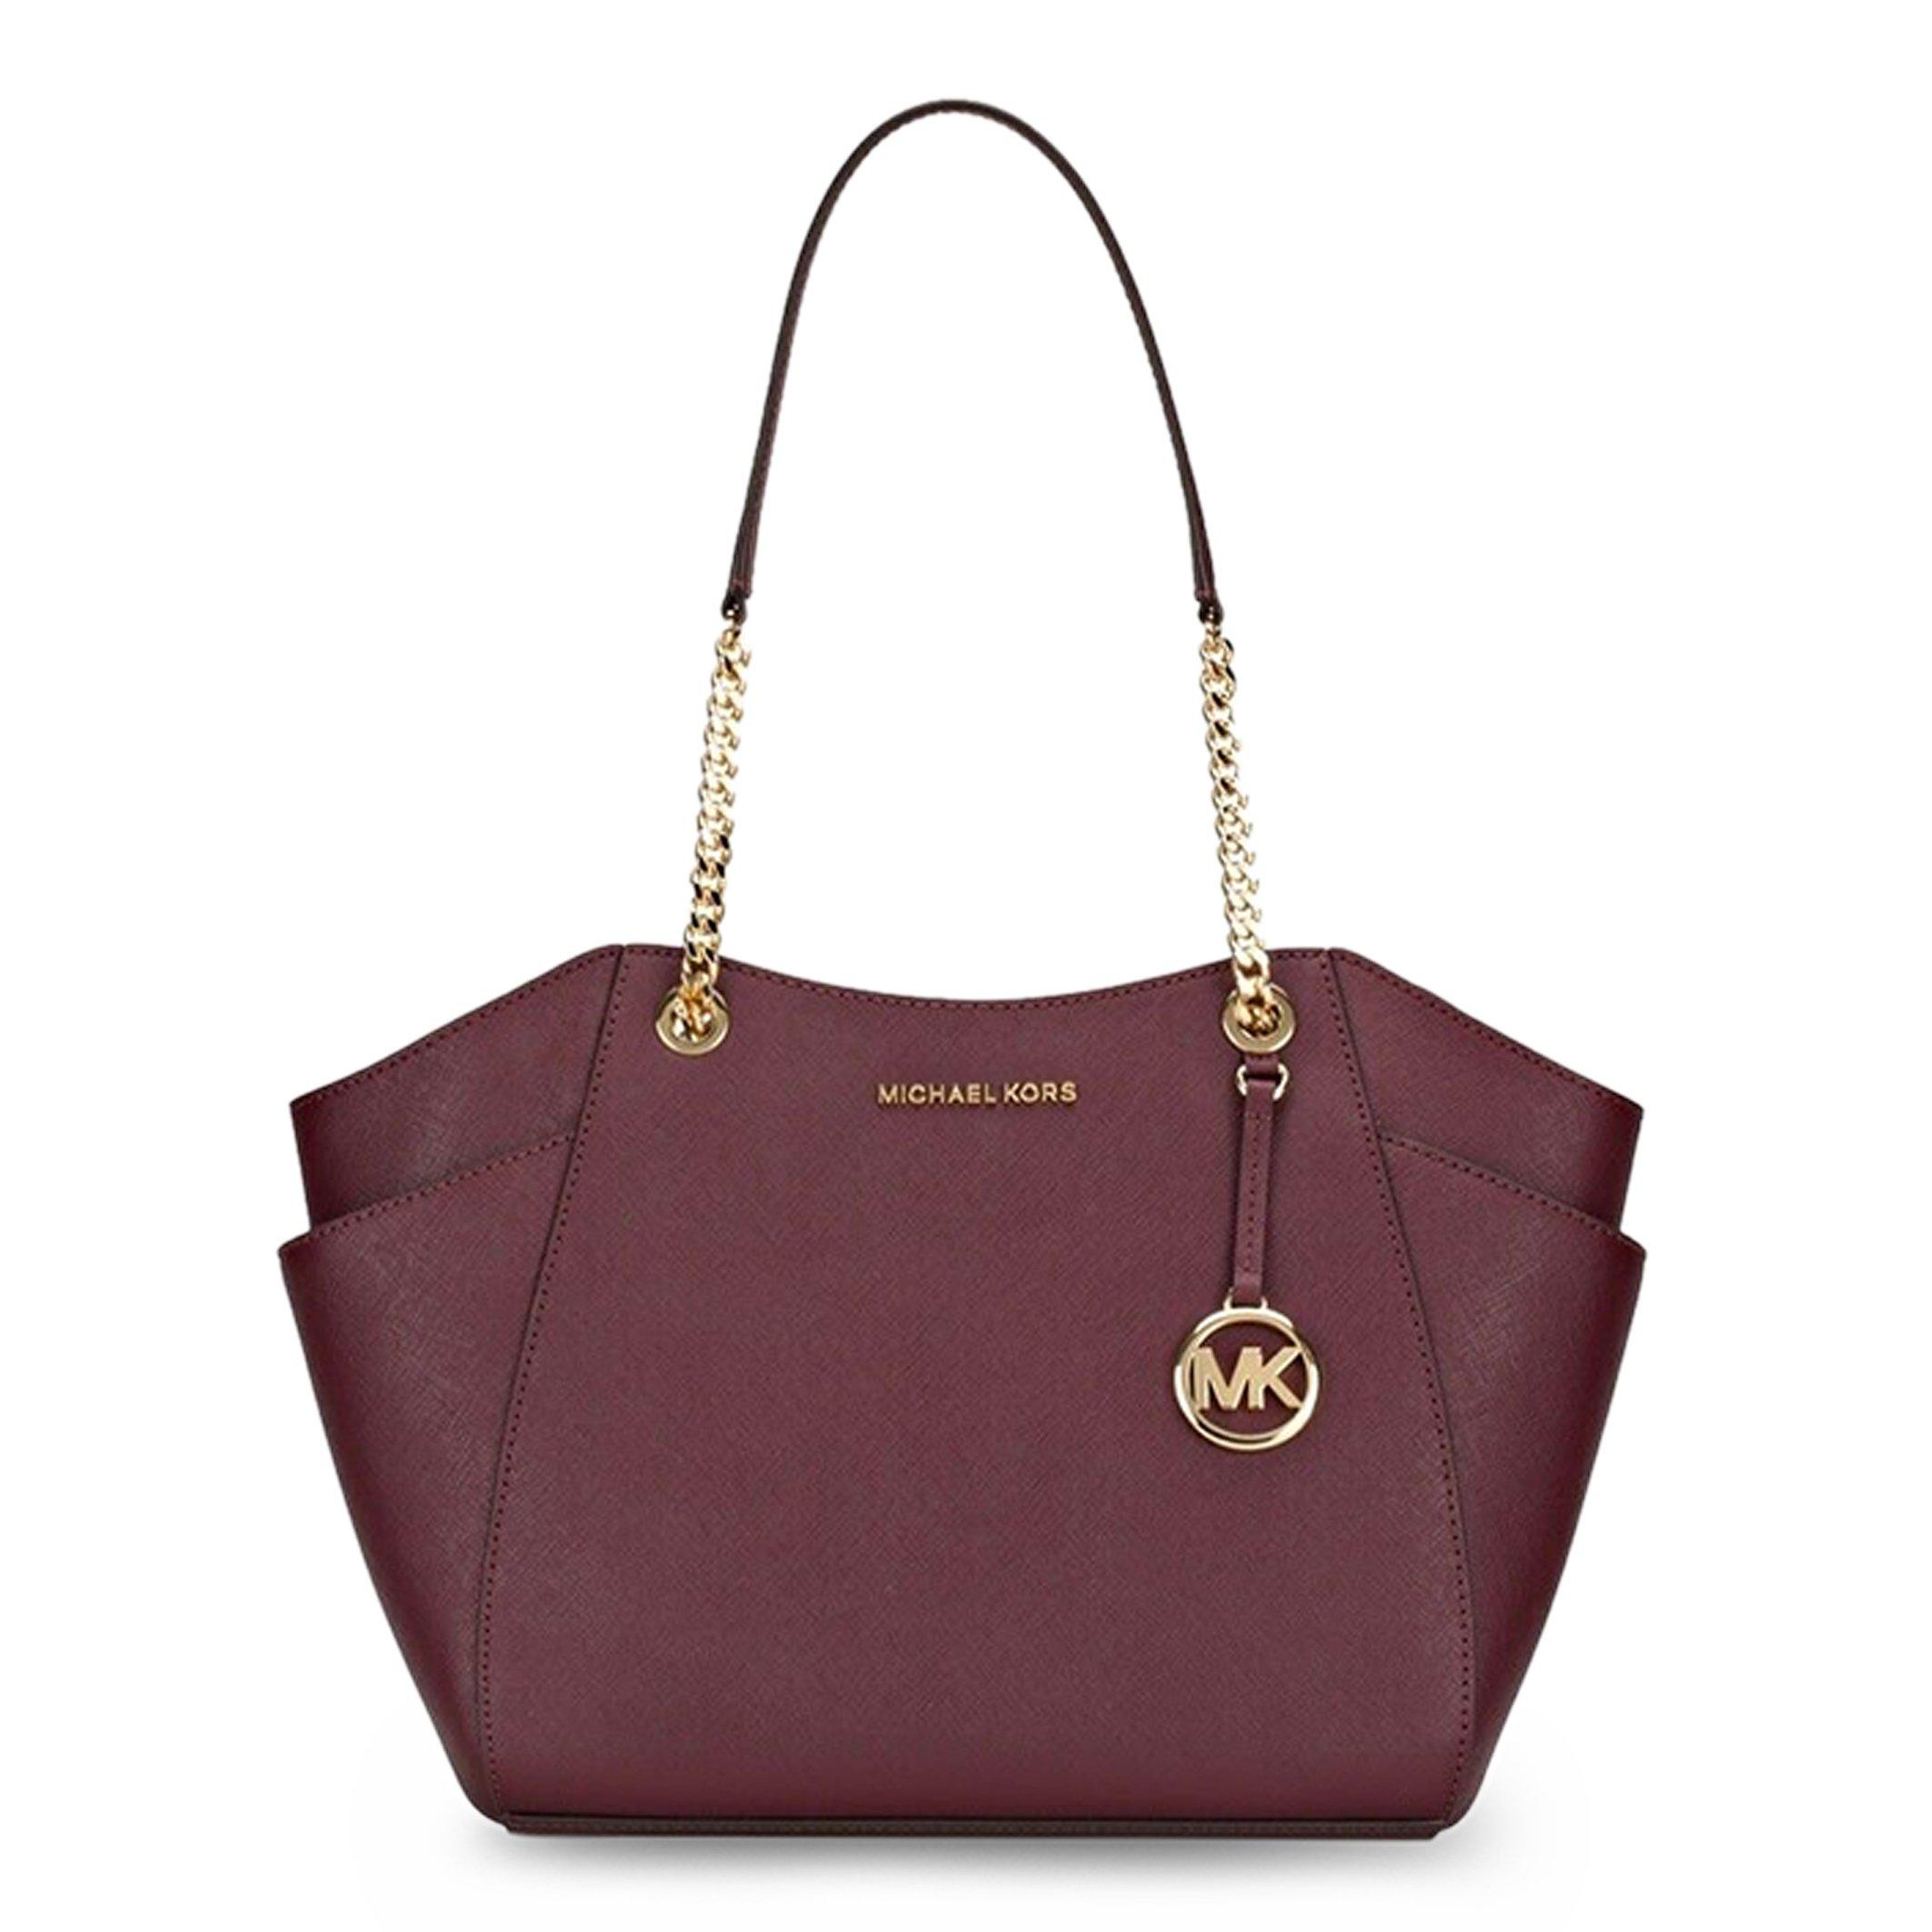 Michael Kors Women's Merlot Shoulder Bag Various Colours 346998 - red NOSIZE